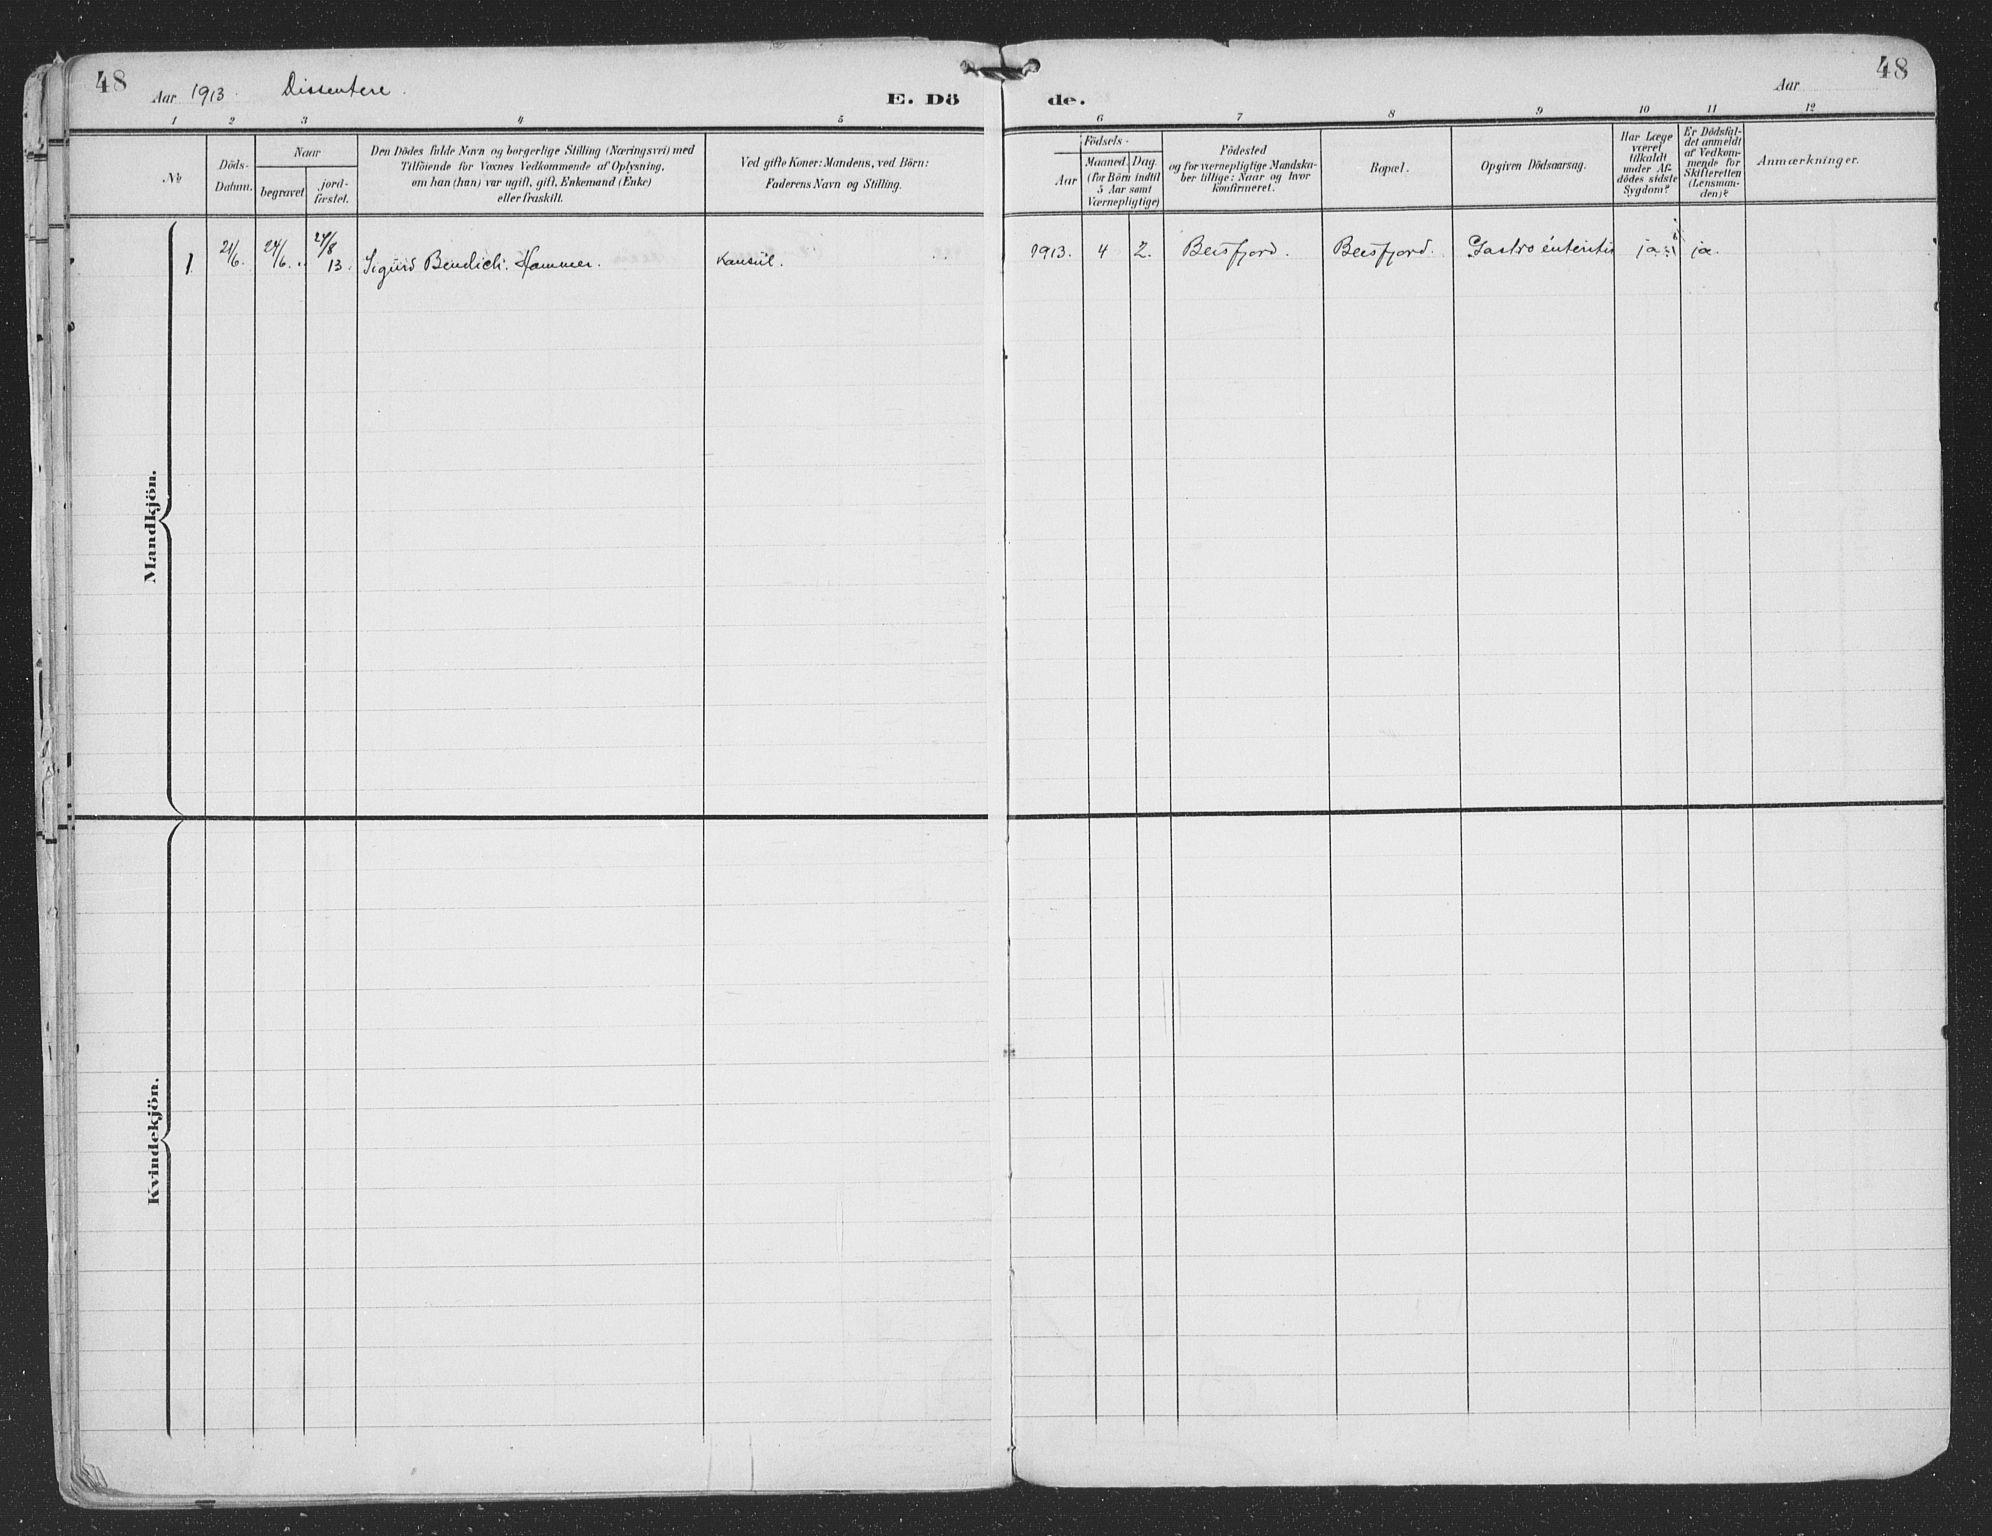 SAT, Ministerialprotokoller, klokkerbøker og fødselsregistre - Nordland, 866/L0940: Ministerialbok nr. 866A03, 1902-1926, s. 48